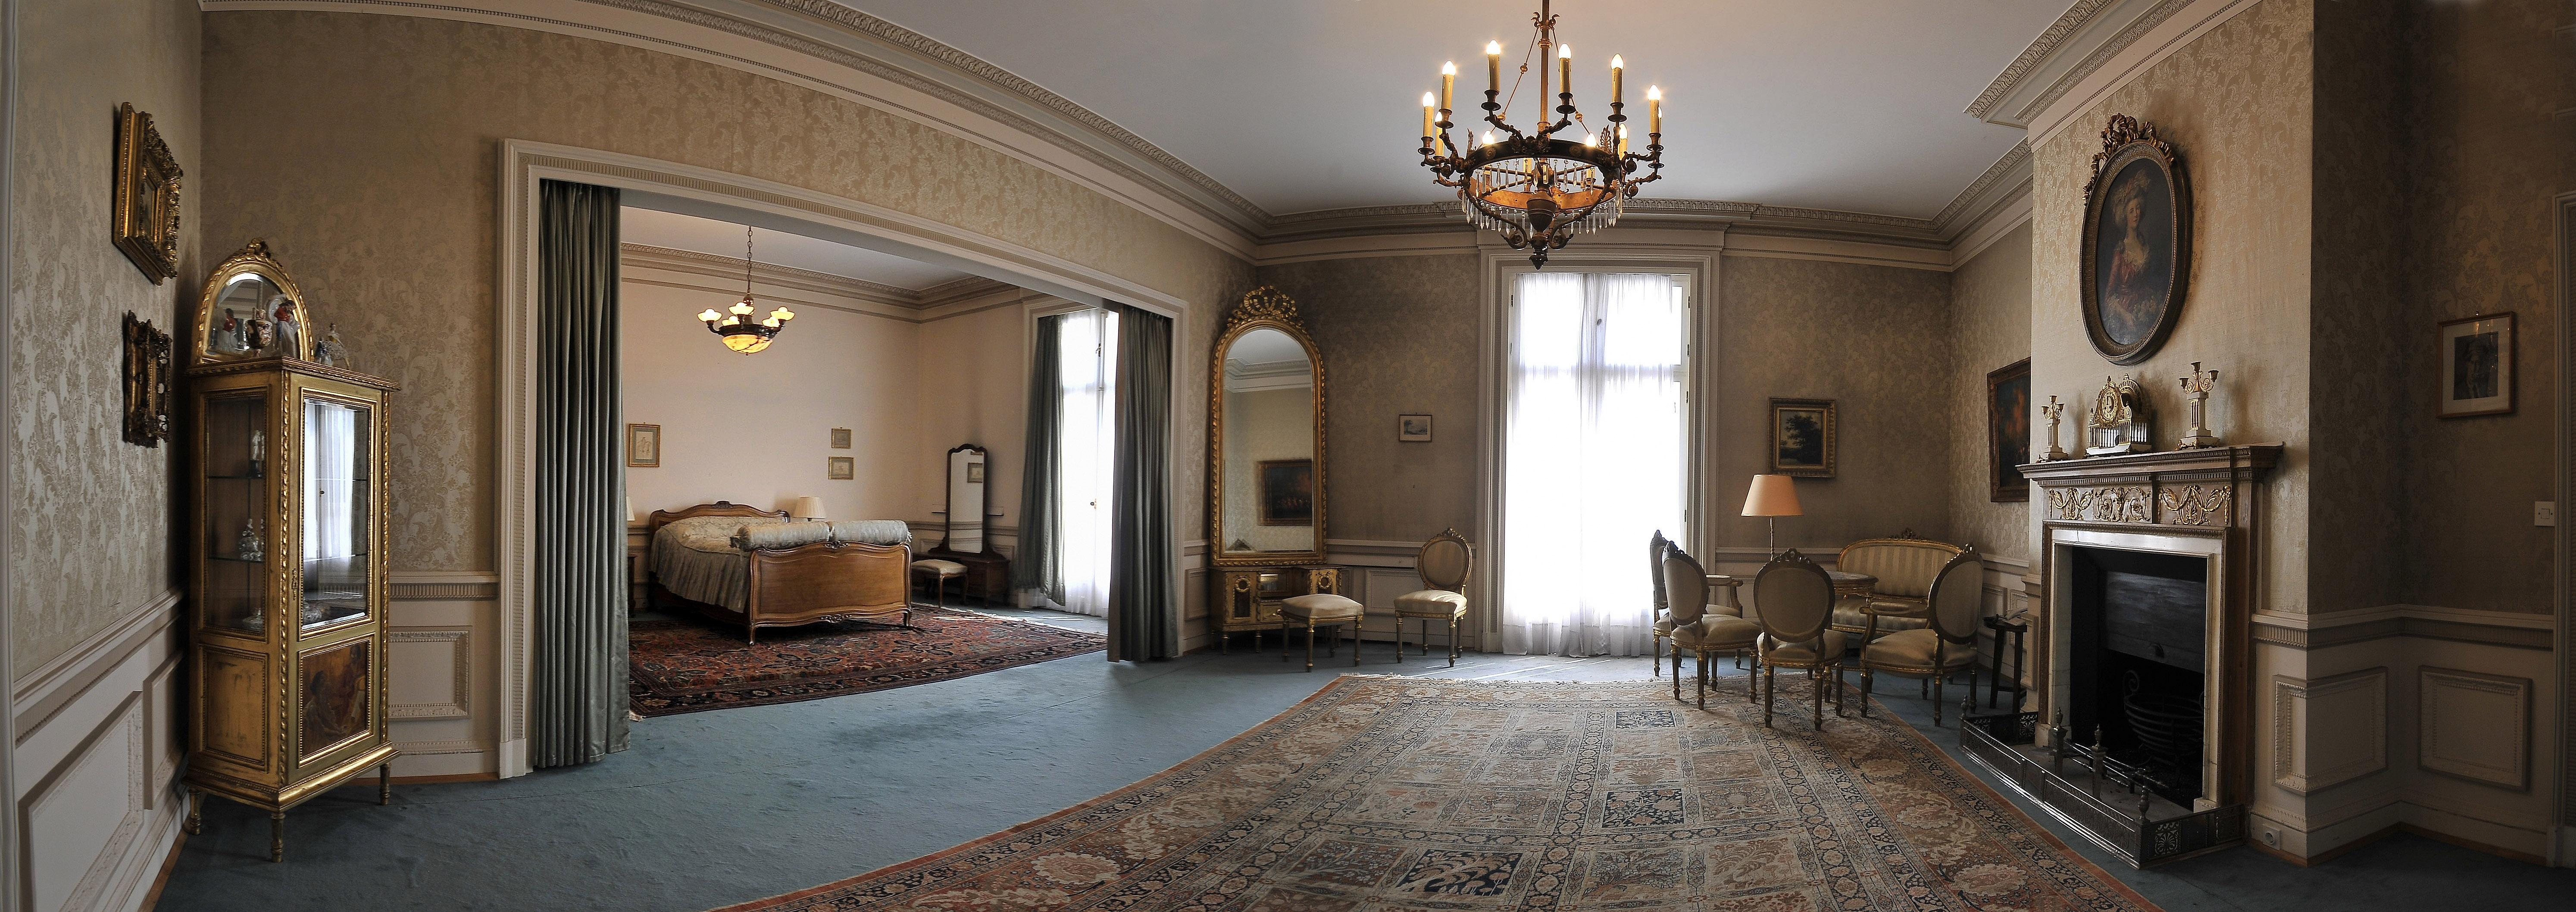 Спаваћа соба Белог двора